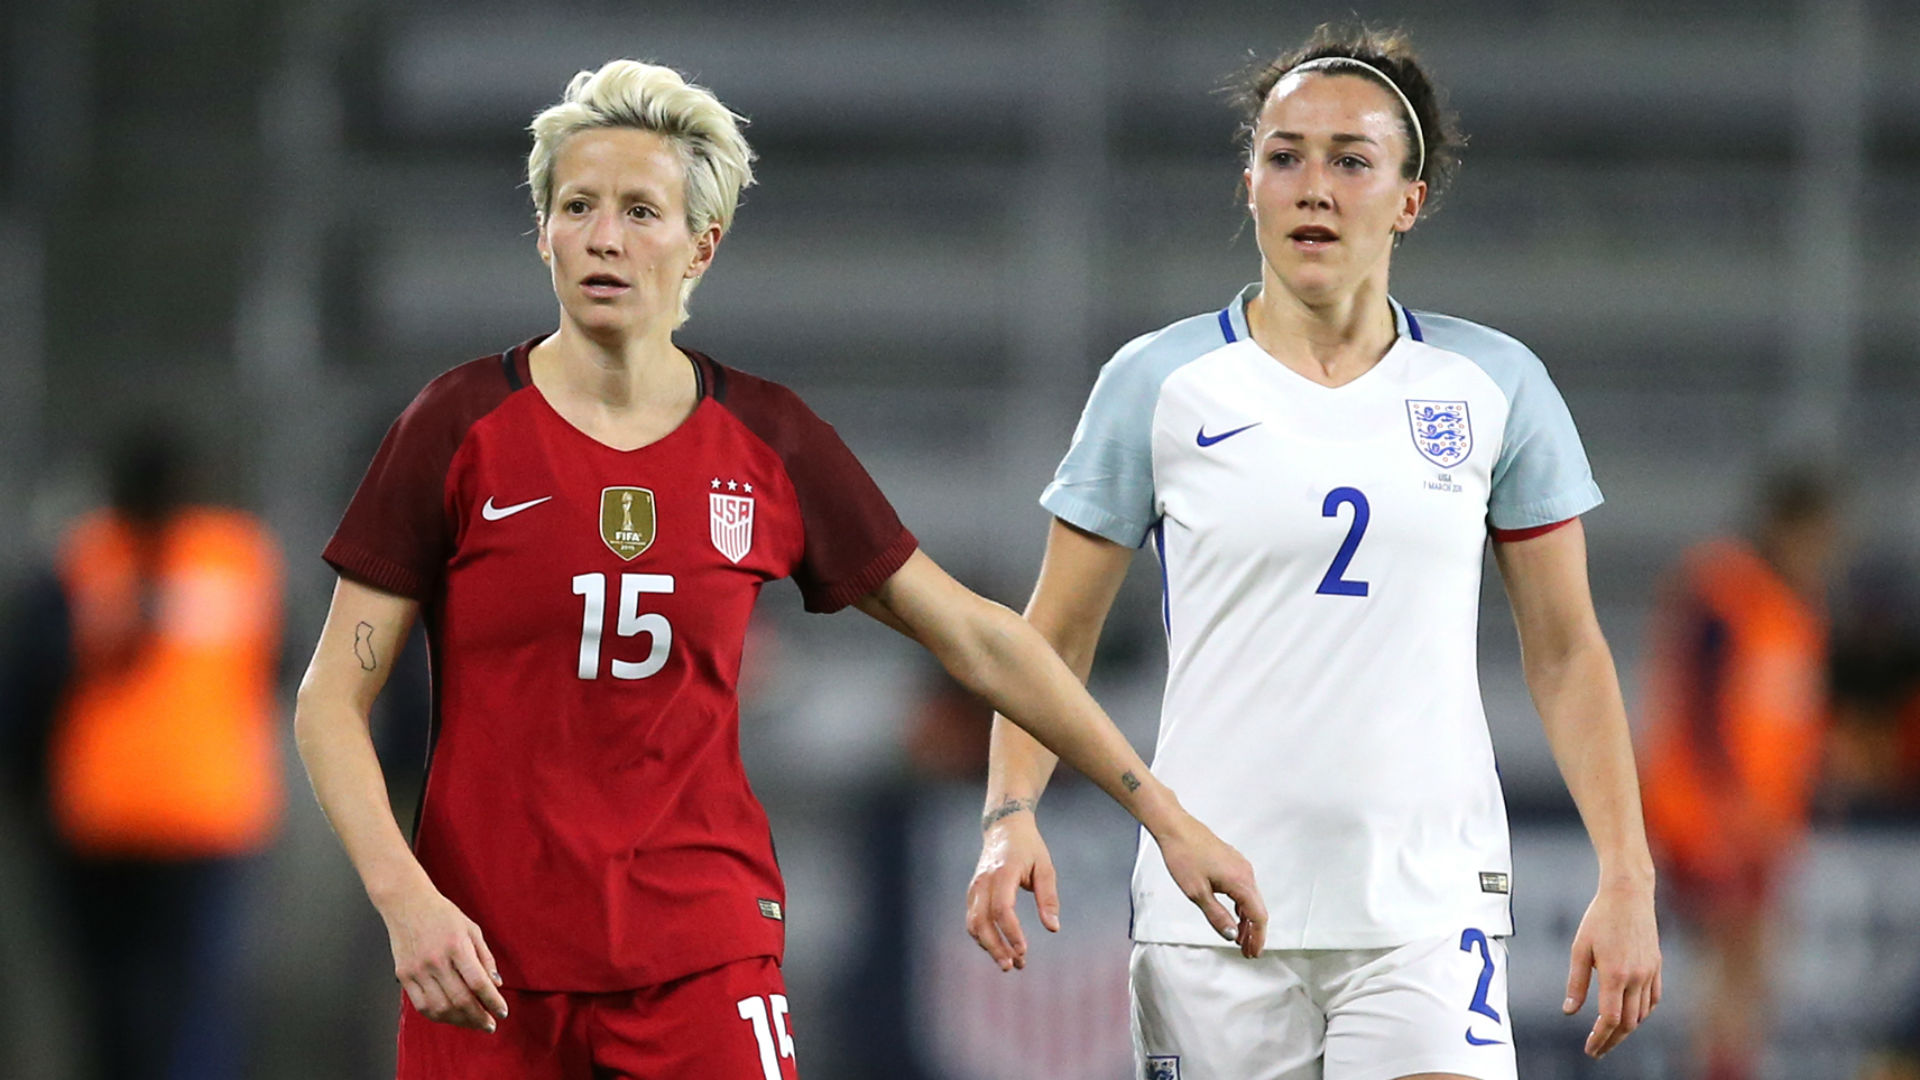 USA vs. England: How key players Megan Rapinoe and Lucy Bronze match up